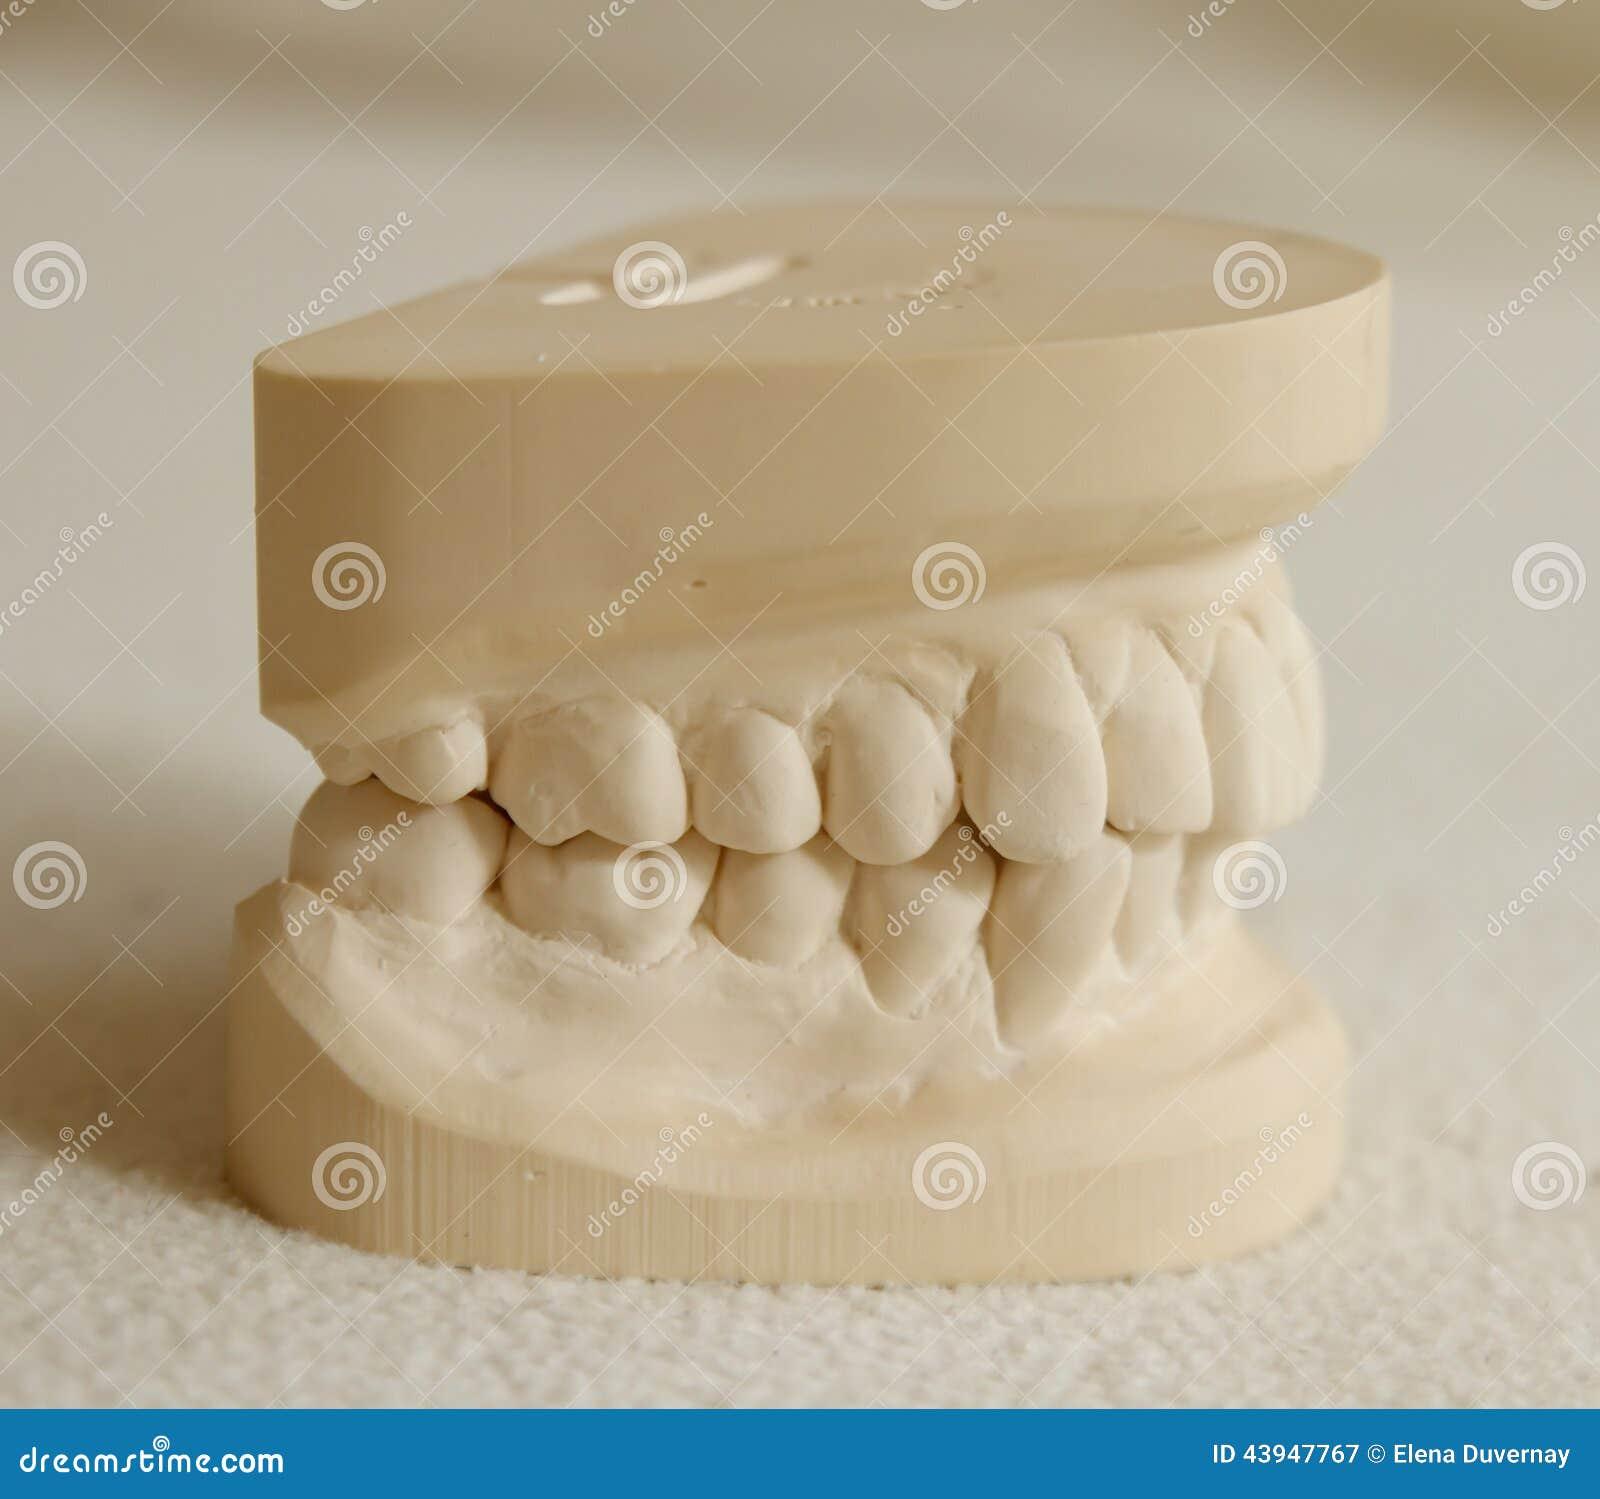 Dental Gypsum Plaster : Dental gypsum model mould of teeth stock photo image